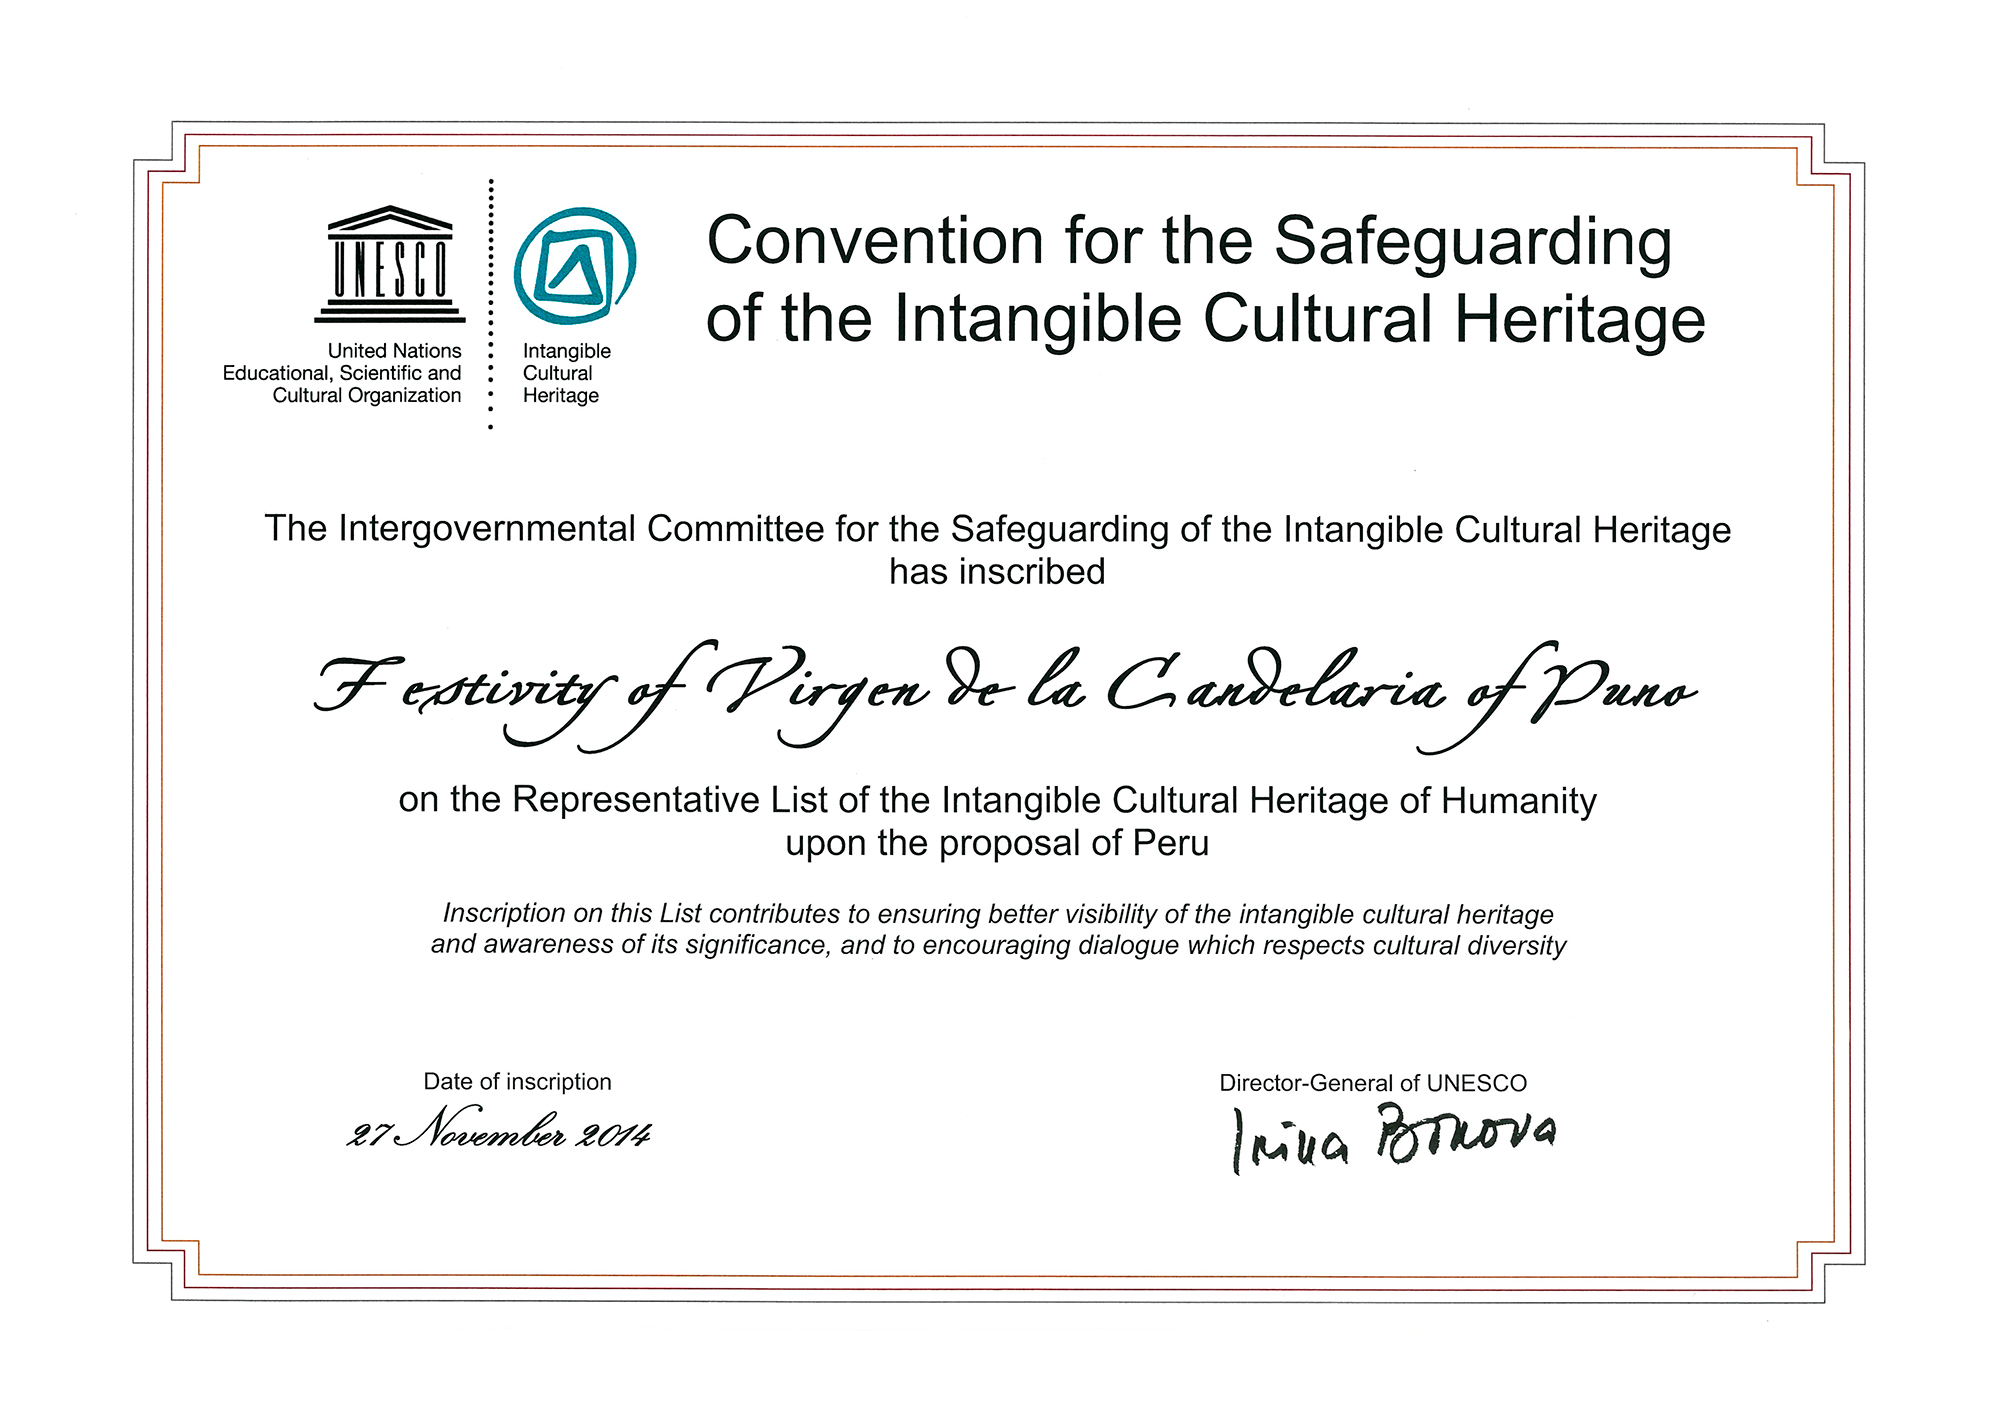 Diploma de la Unesco - Festividad Virgen de la Candelaria   Perú Caporal   perucaporal.com